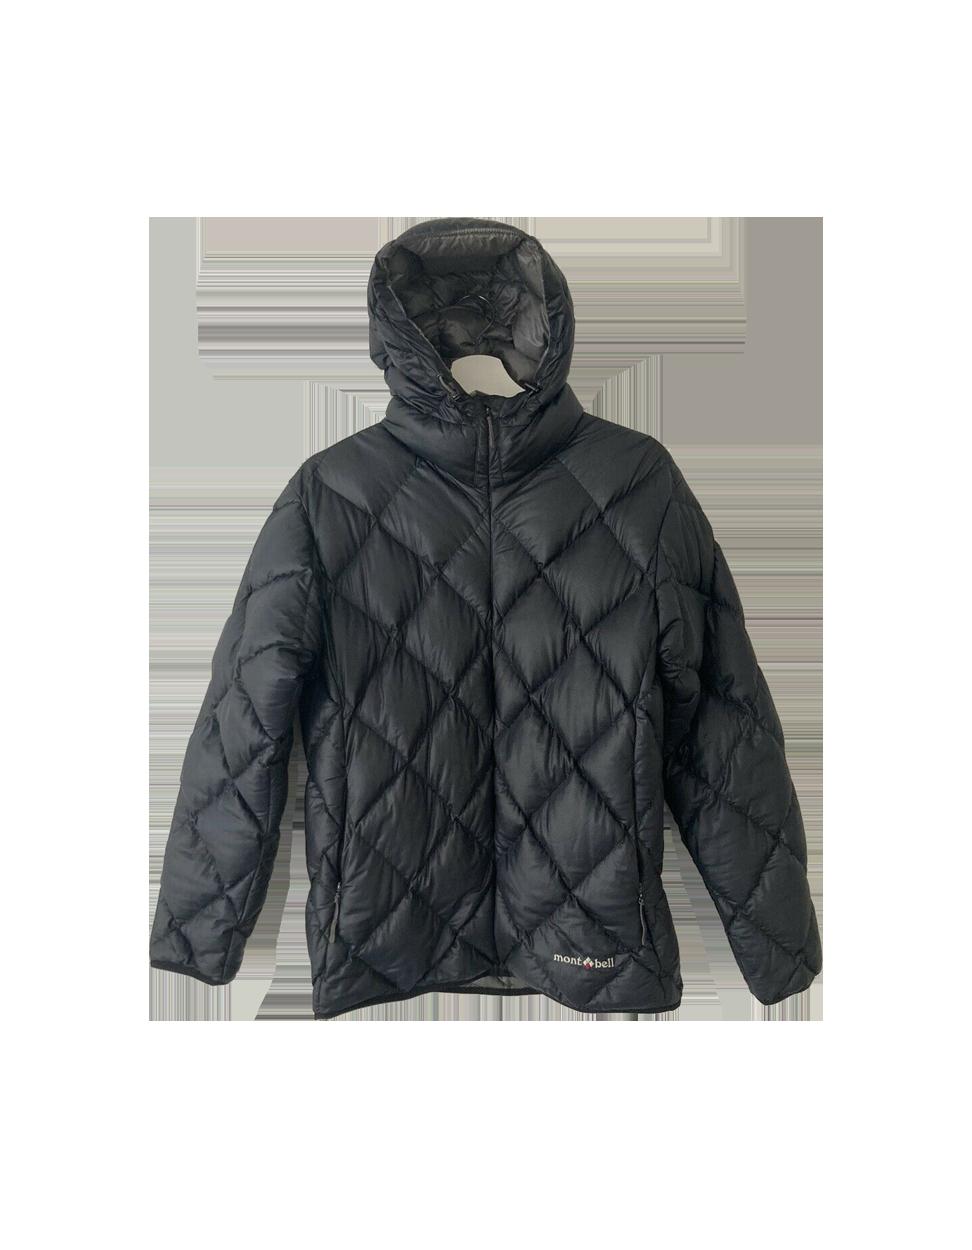 Montbell Navy Diamond Stitch Down Jacket